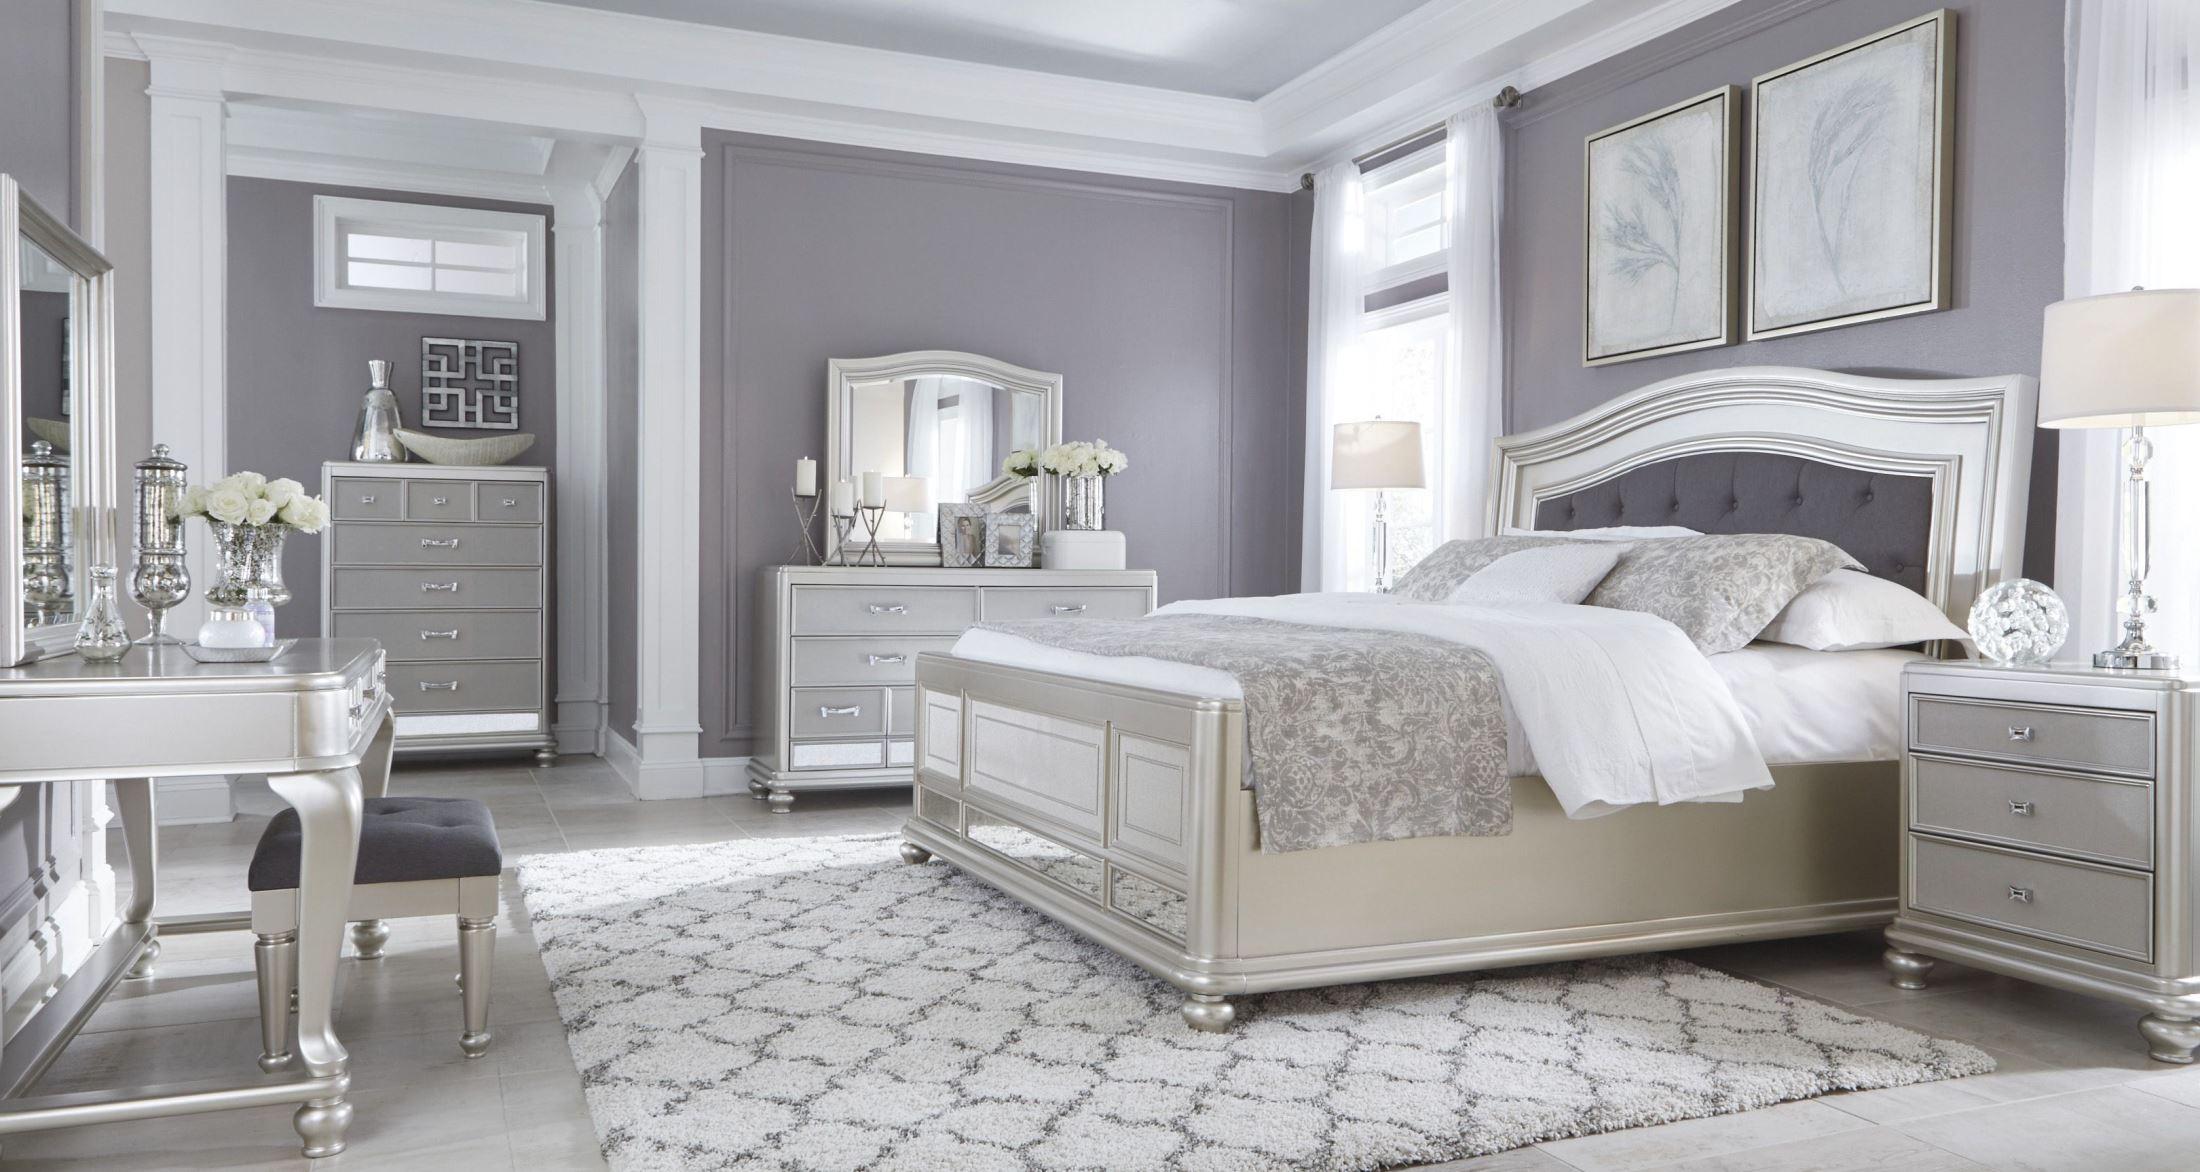 بالصور غرف نوم جديده , احدث غرف النوم 2019 4042 14